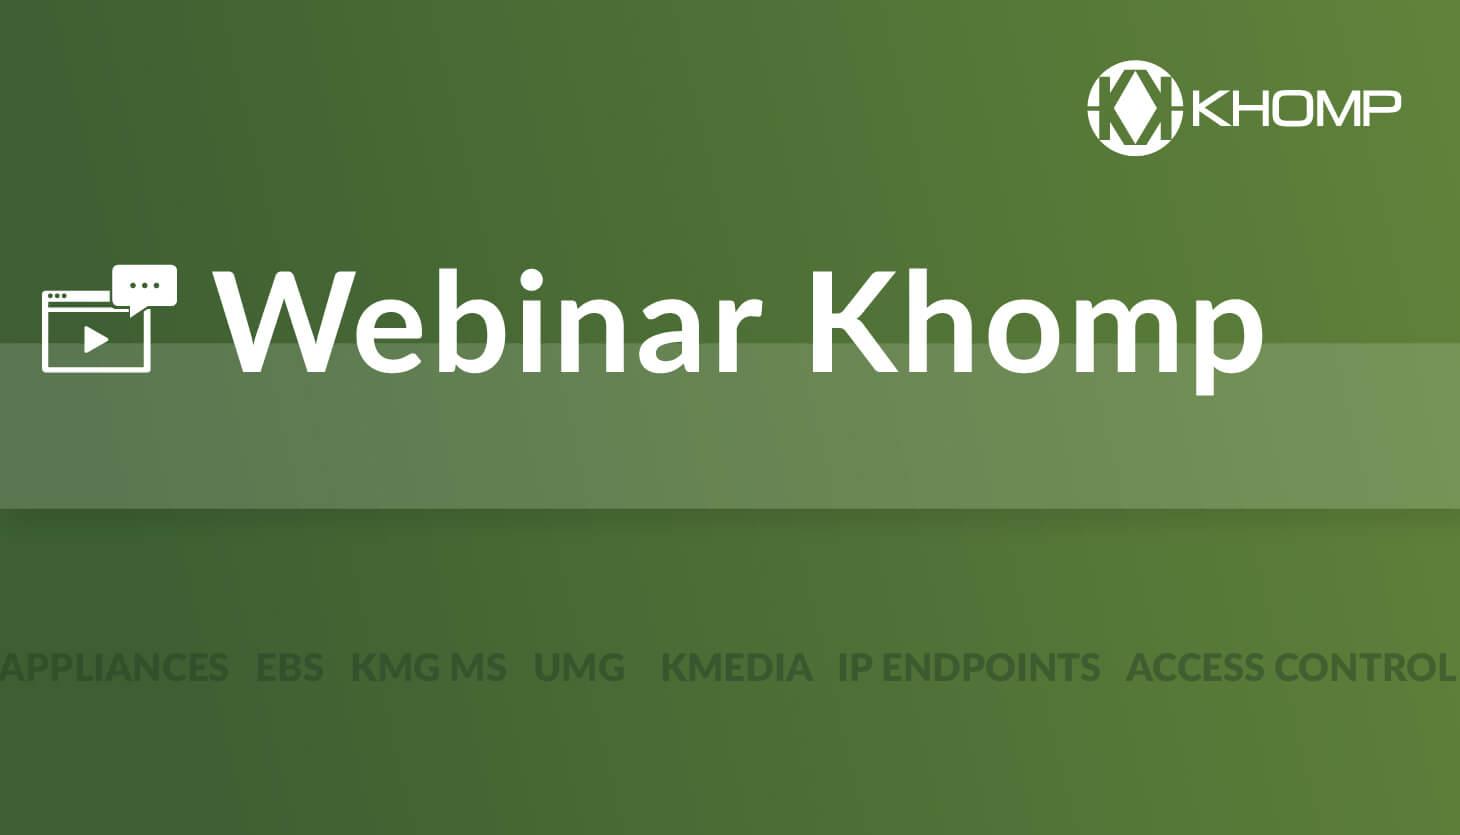 webinar Khomp portfolio available